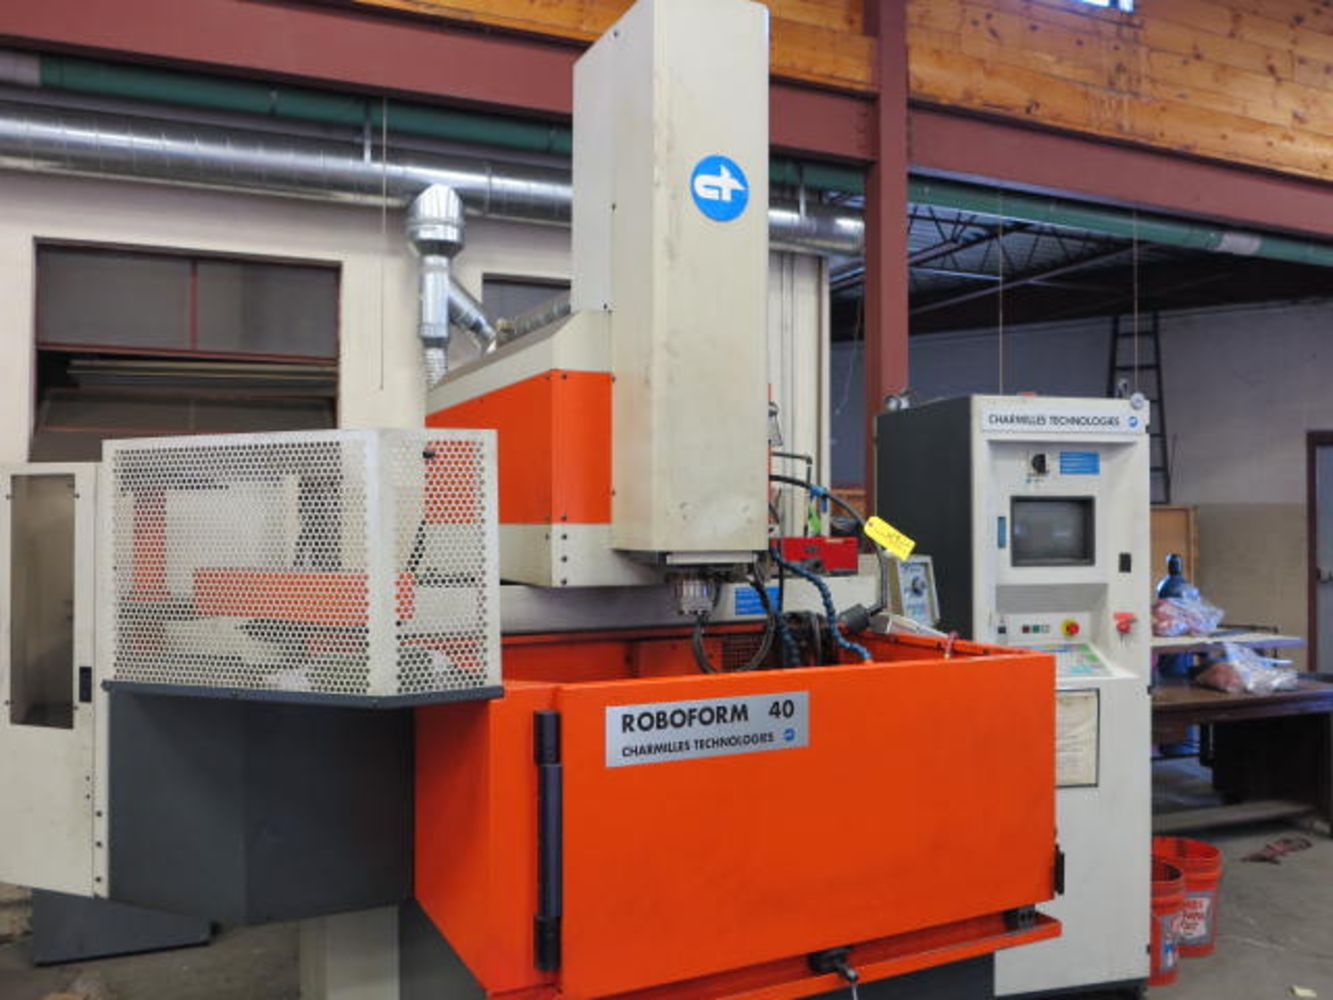 3, 4 & 5 Axis CNC Machine Tools, Blanchard Grinders, Charmille Roboform EDMS, Lathes, Mills, Raidal Arm Mills of Newport Tool & Die, Inc.